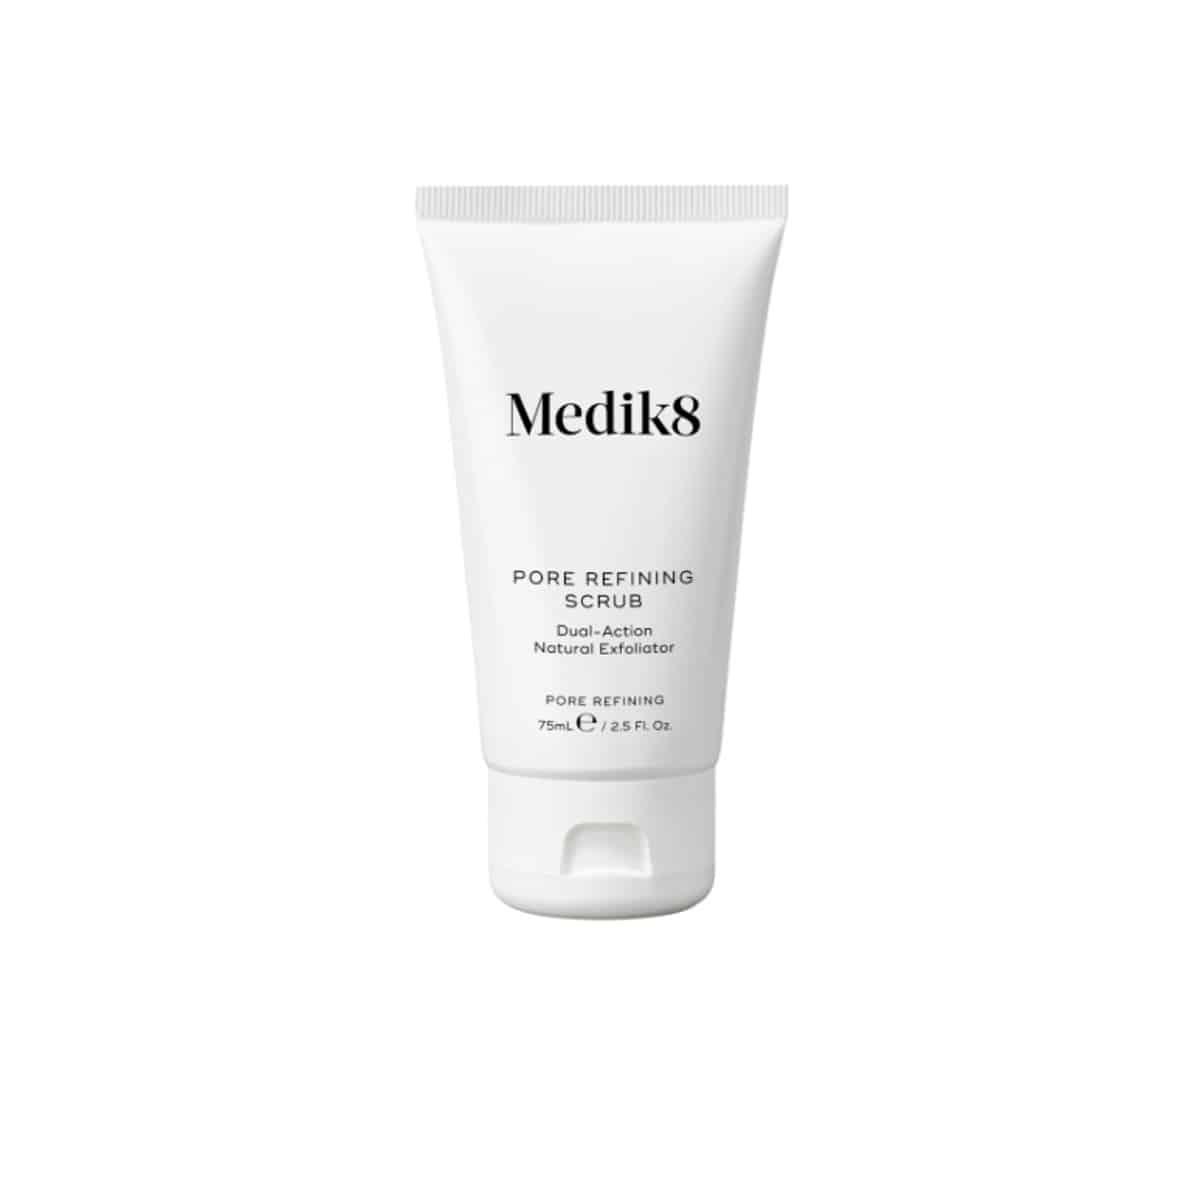 Medik8 Pore Refining Scrub Ireland